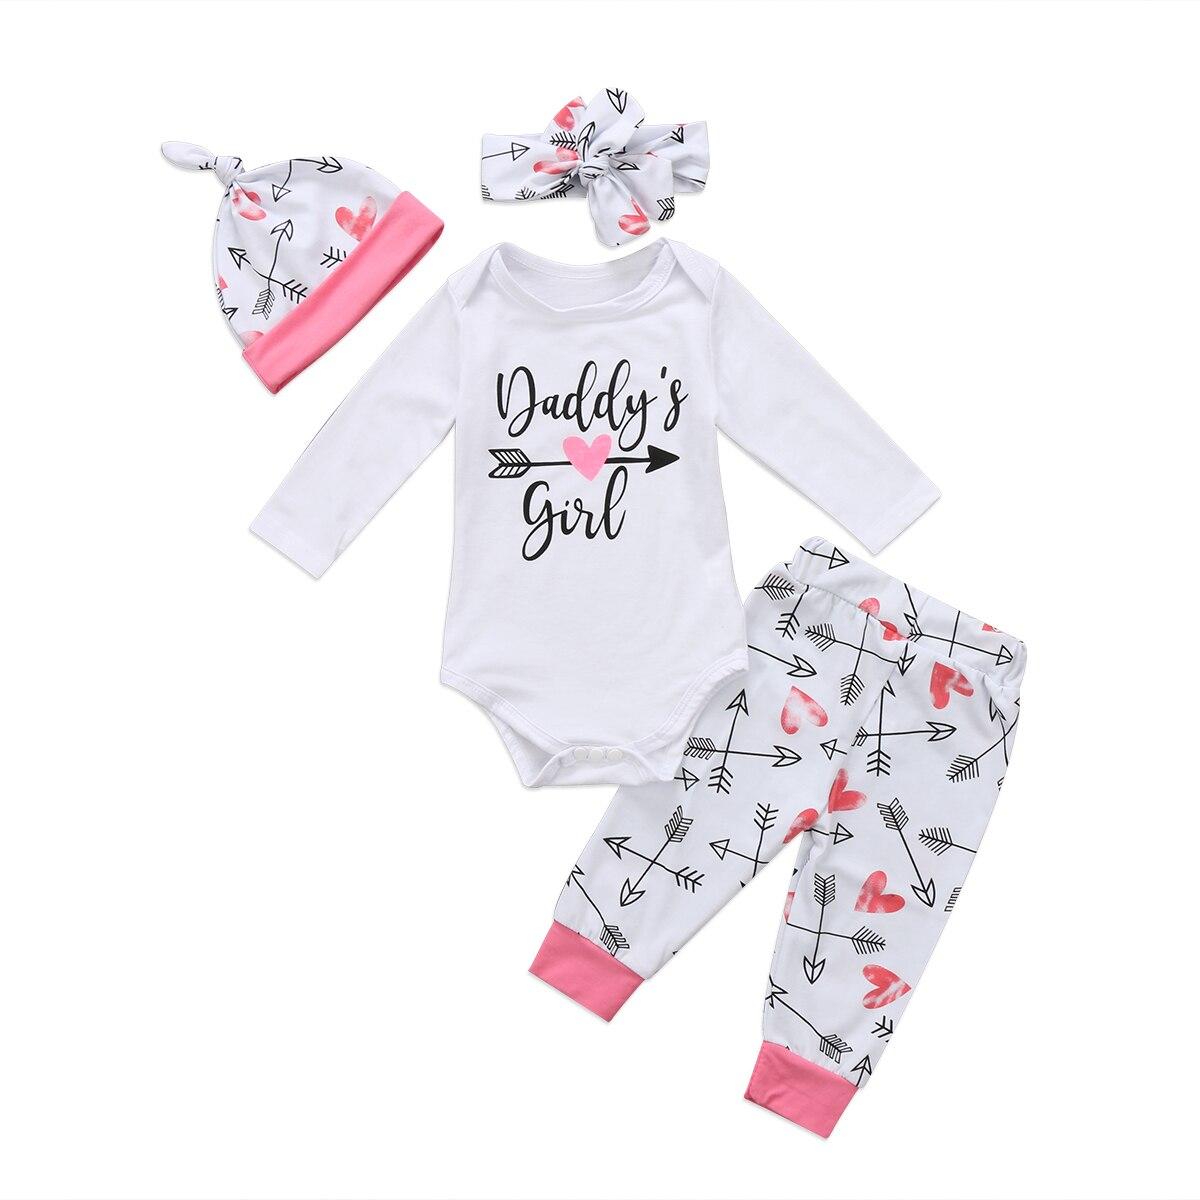 042cfcef3b1 4PCS Sweet Newborn Infant Baby Girls 2017 Clothes Playsuit Daddy Girl  Romper Arrow Pants Hat Headwear